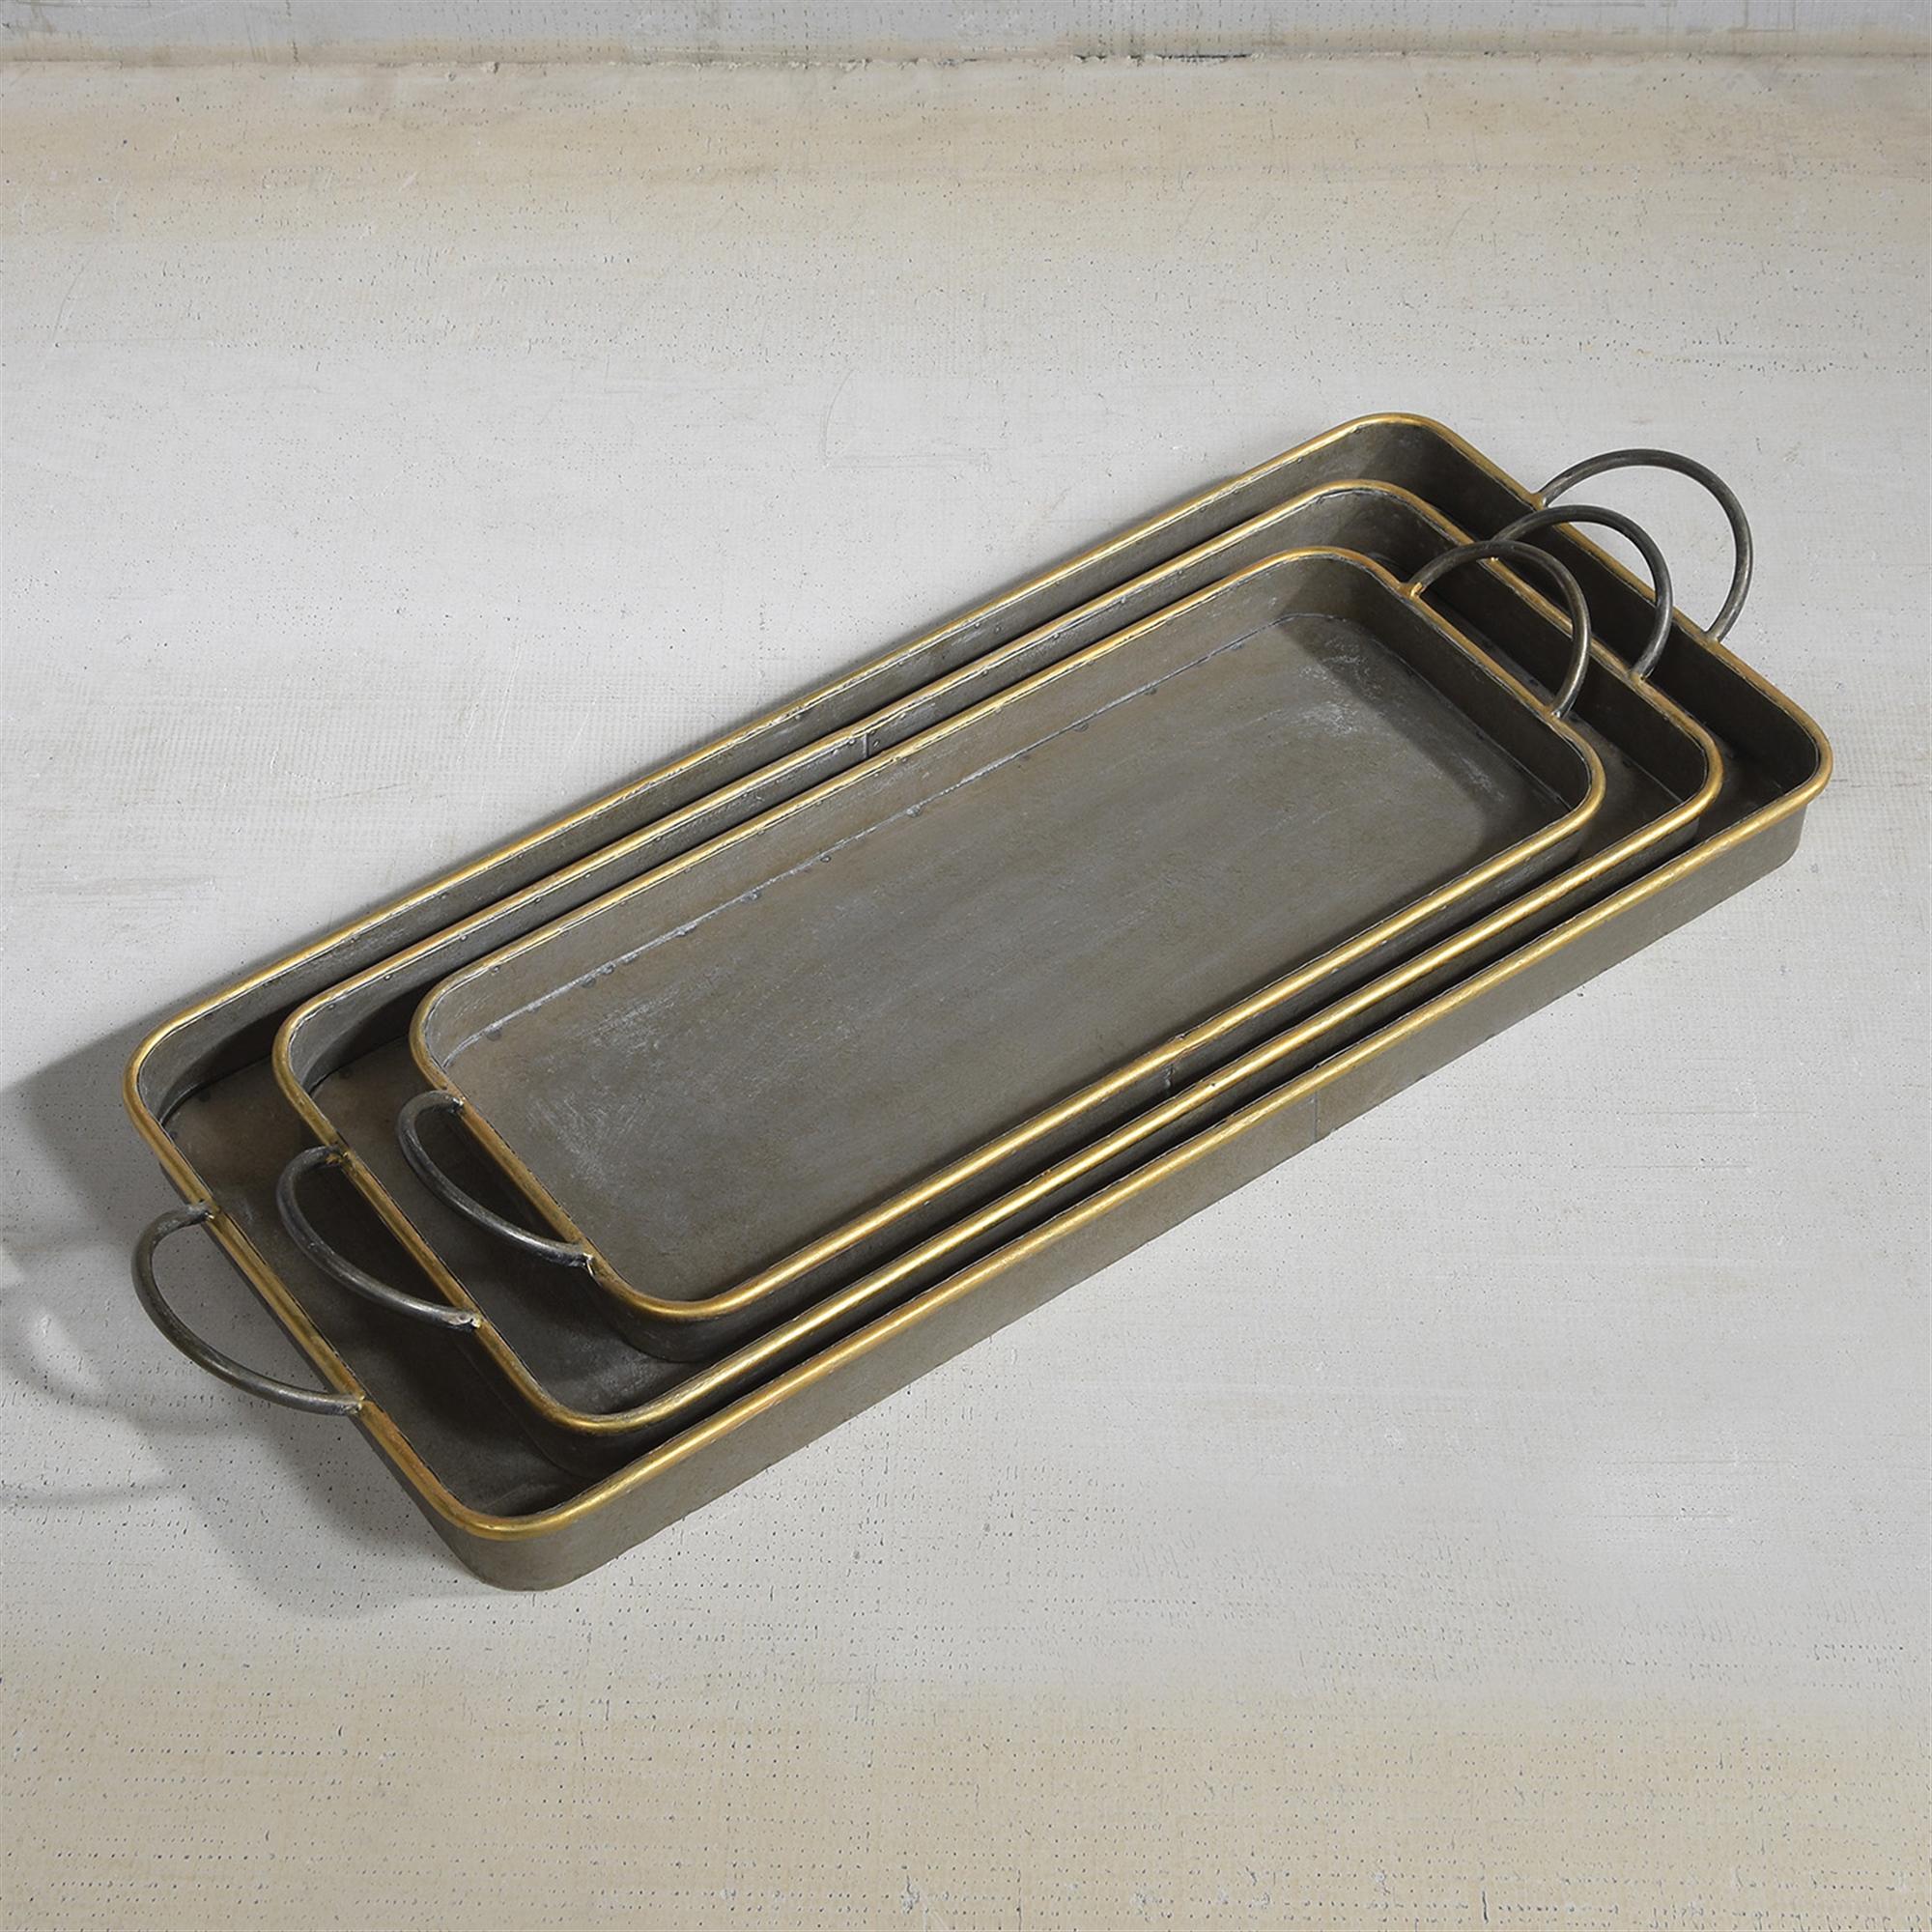 50010-54 - Archer Galvanized Trays - Set of 3 - Galvanized with Gold Rim by HomArt